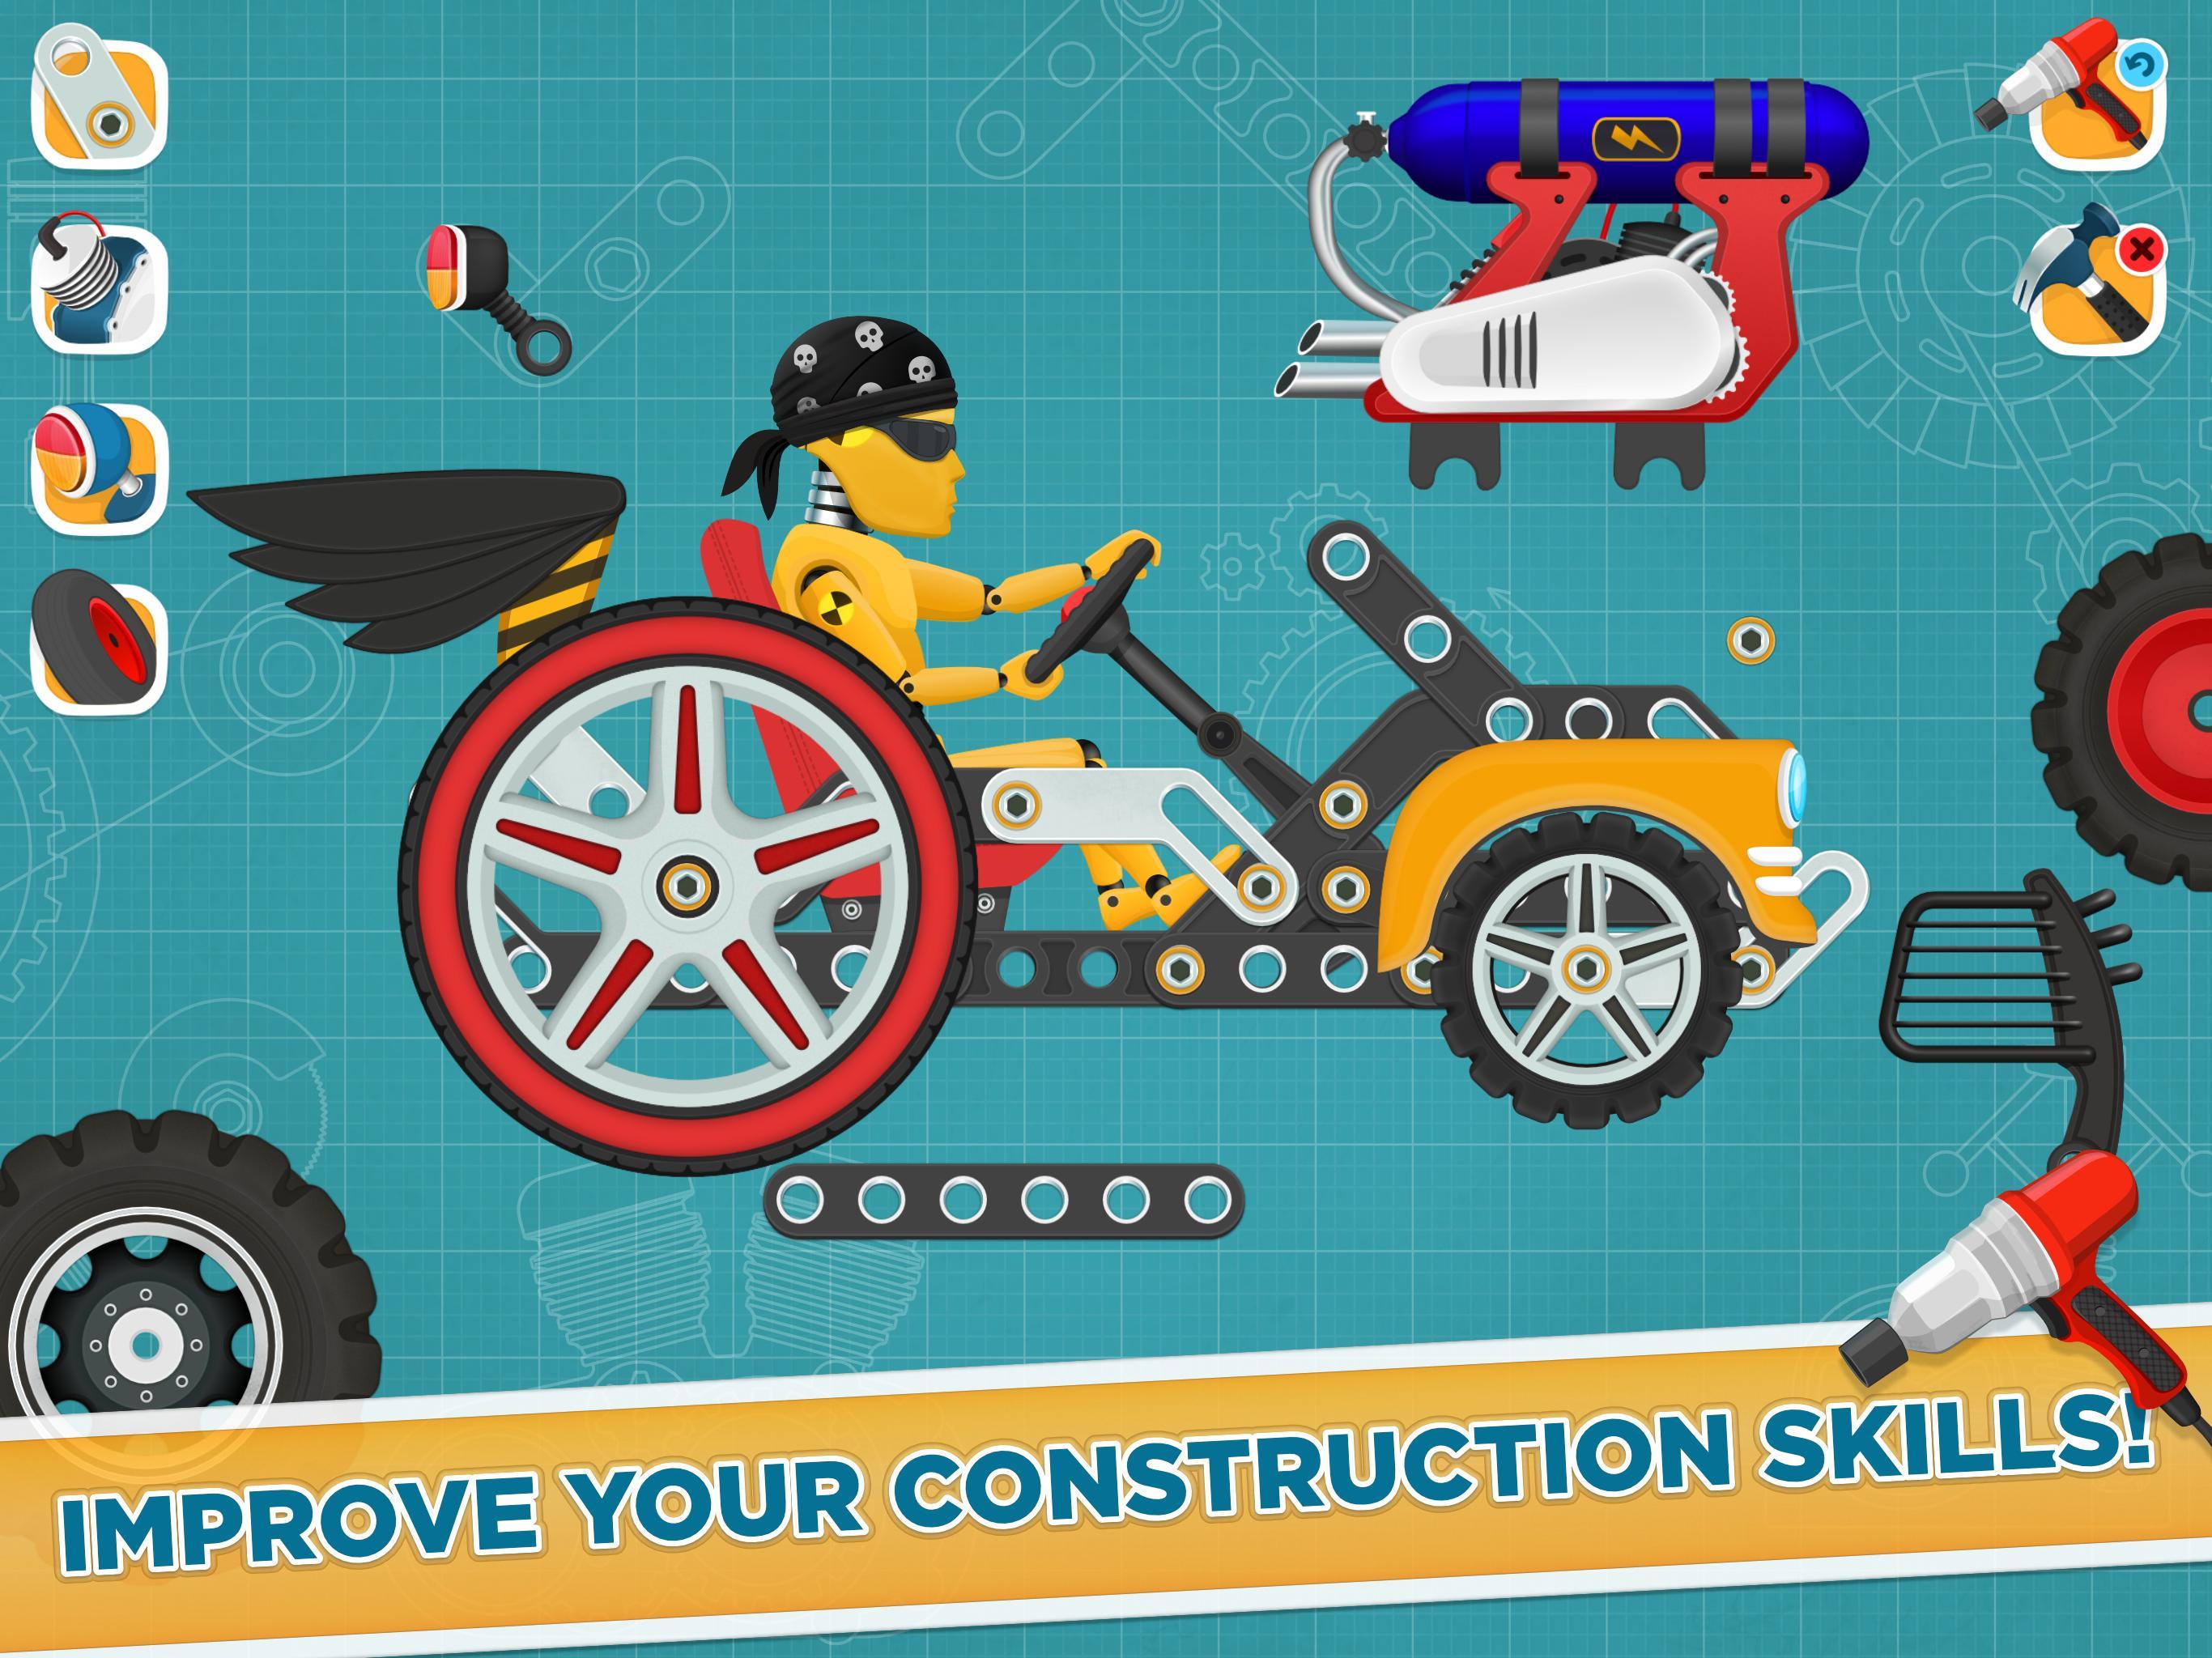 Car Builder and Racing Game for Kids 1.3 Screenshot 16